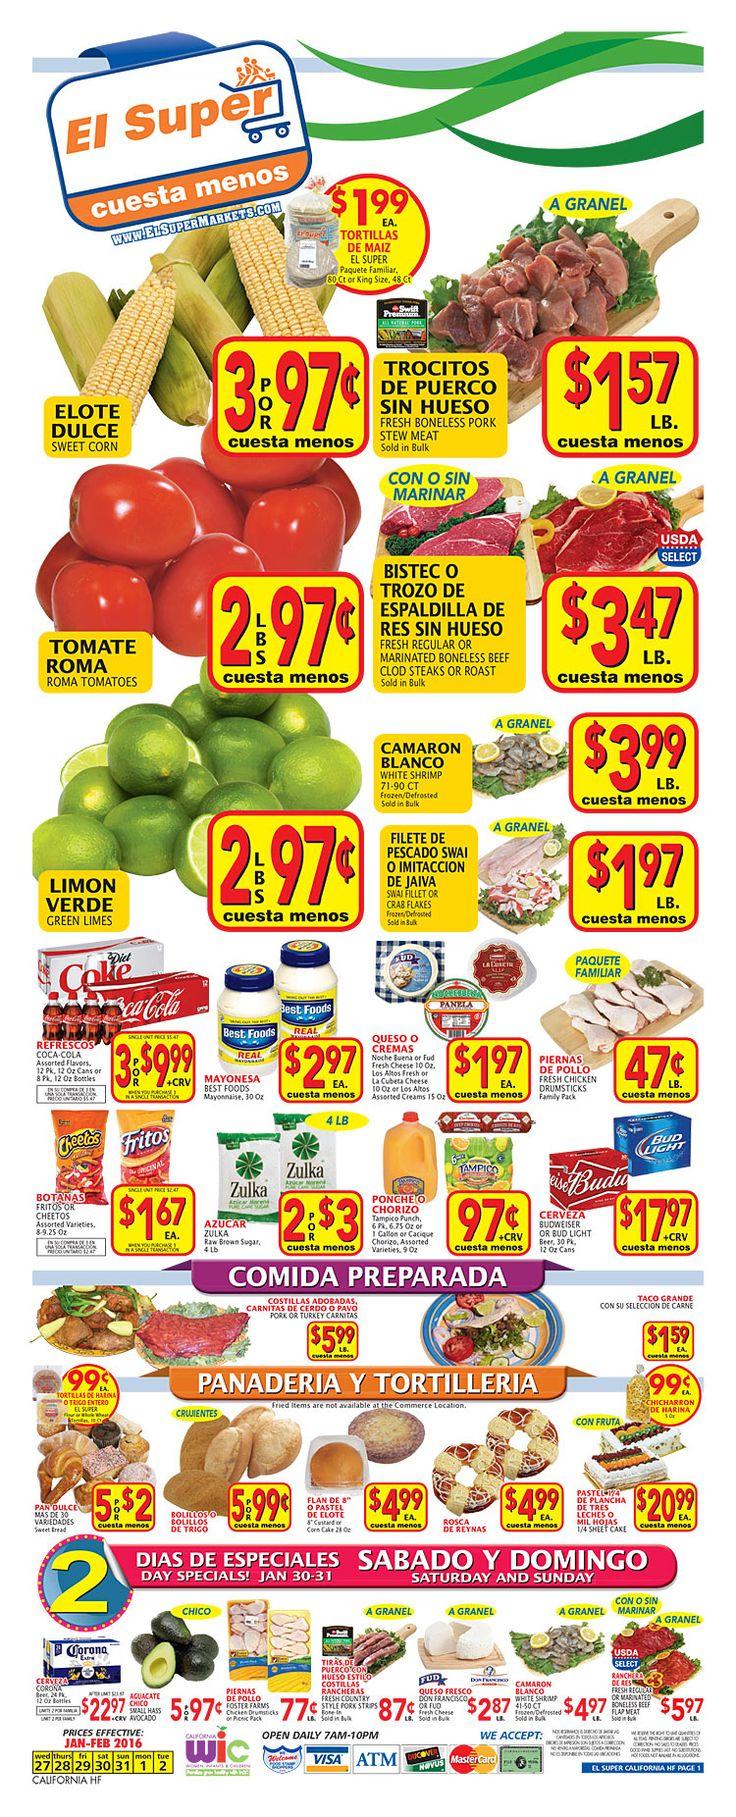 El Super Weekly Ad January 27 - February 2, 2016 - http://www.kaitalog.com/el-super-weekly-ad.html